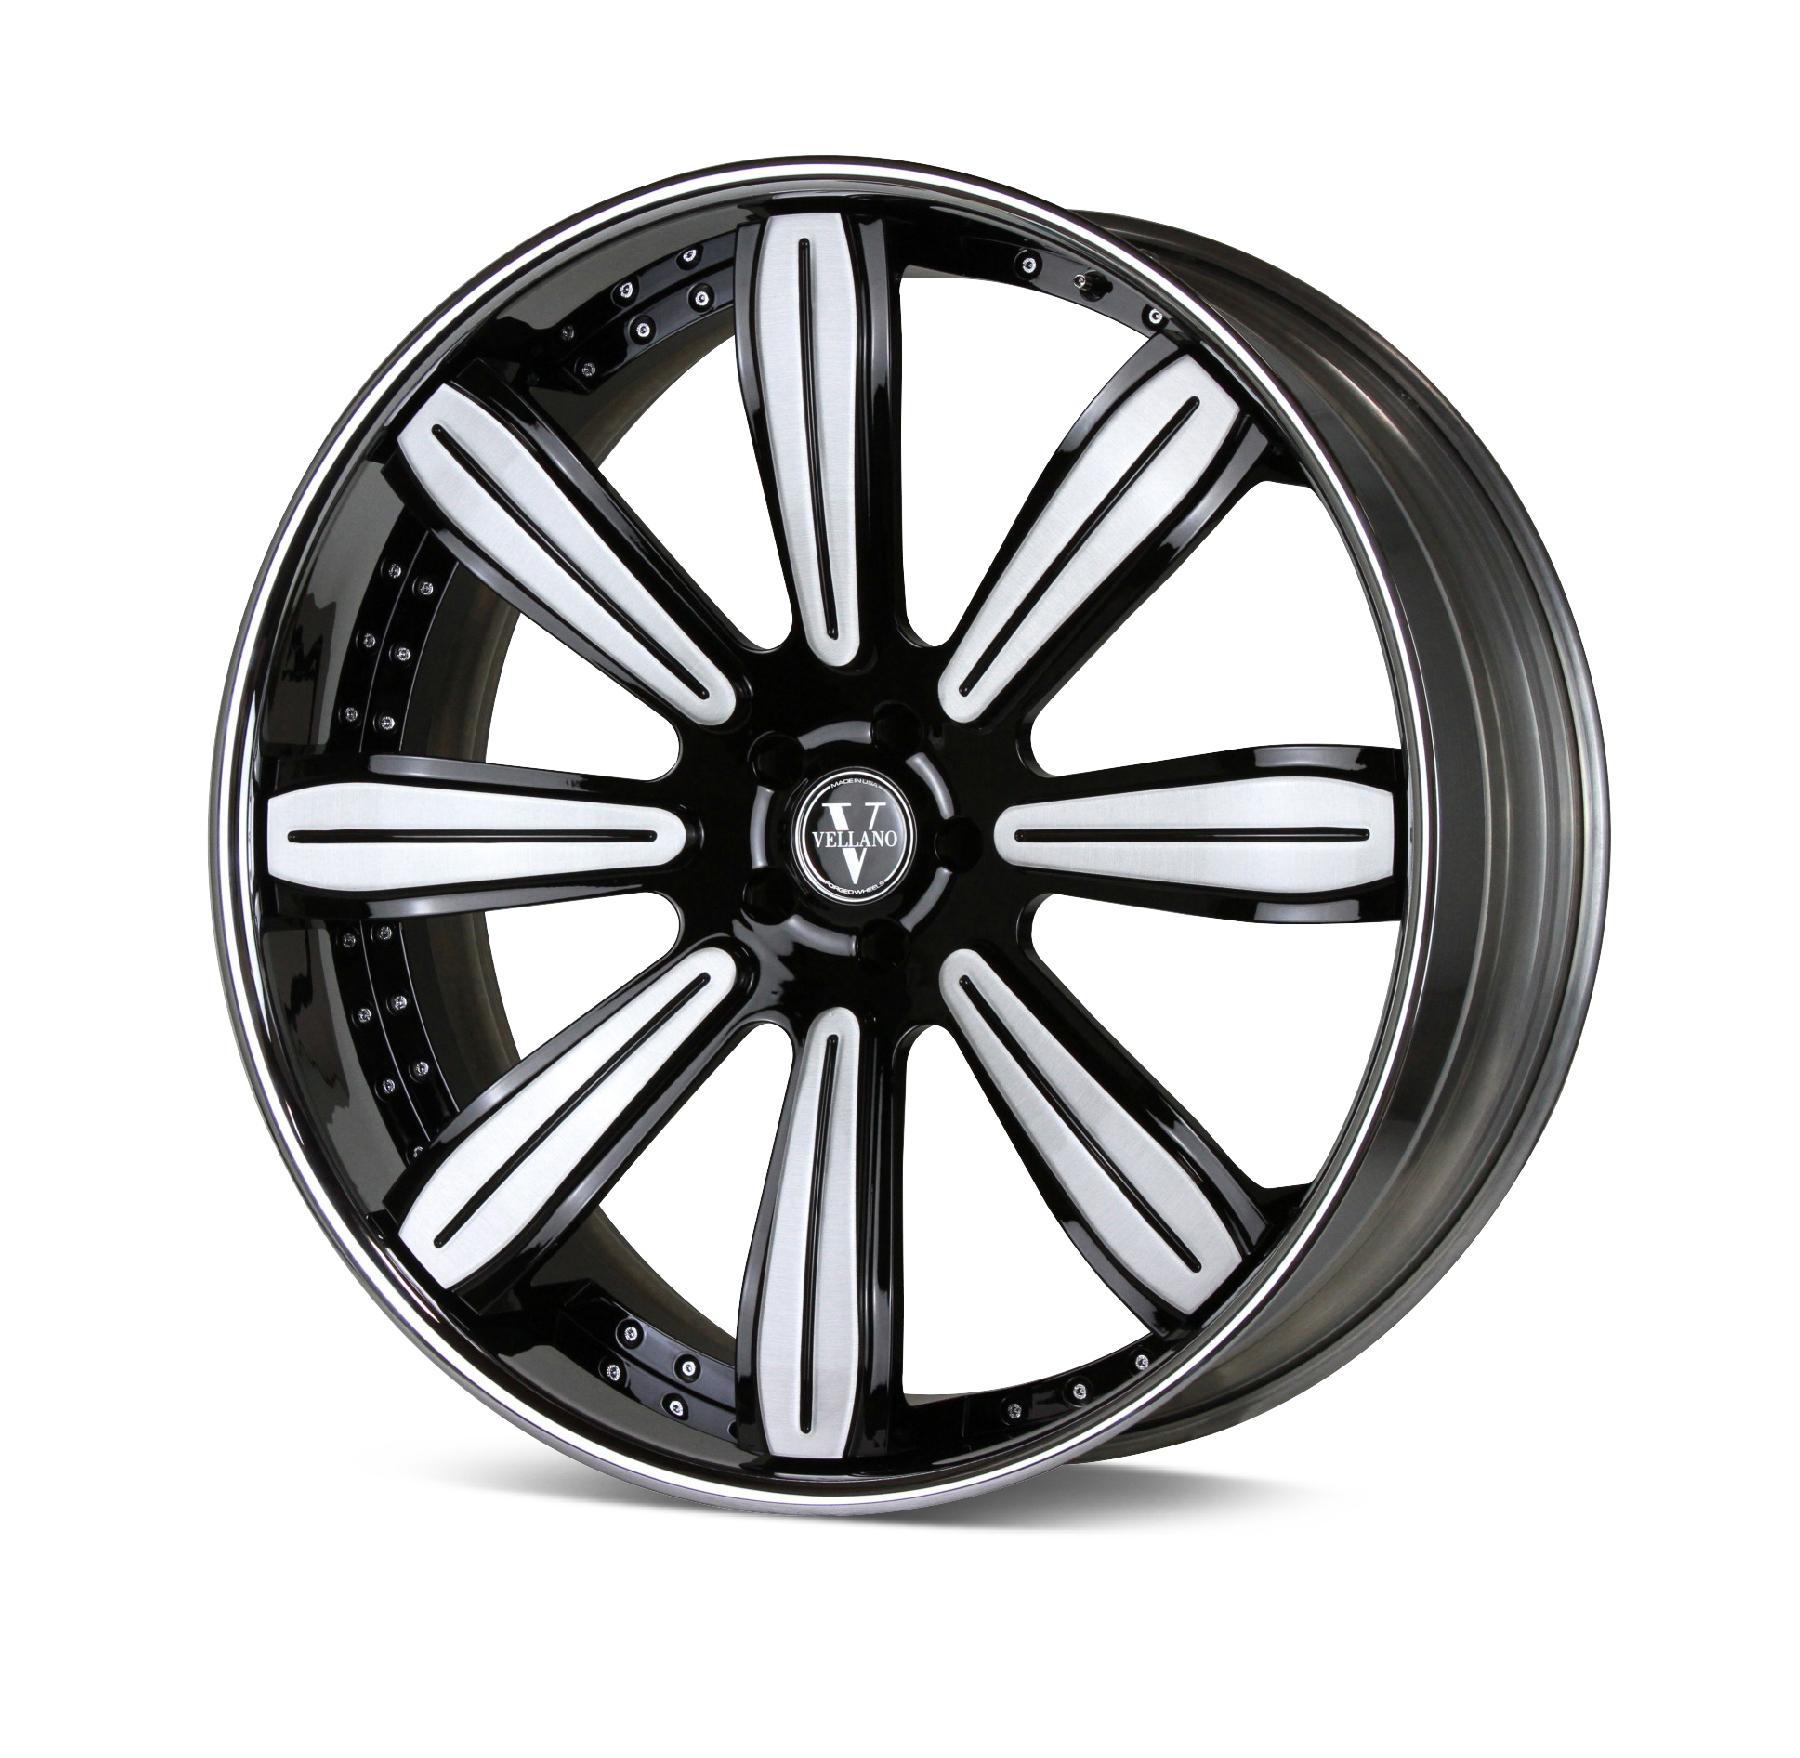 Vellano VKB forged wheels